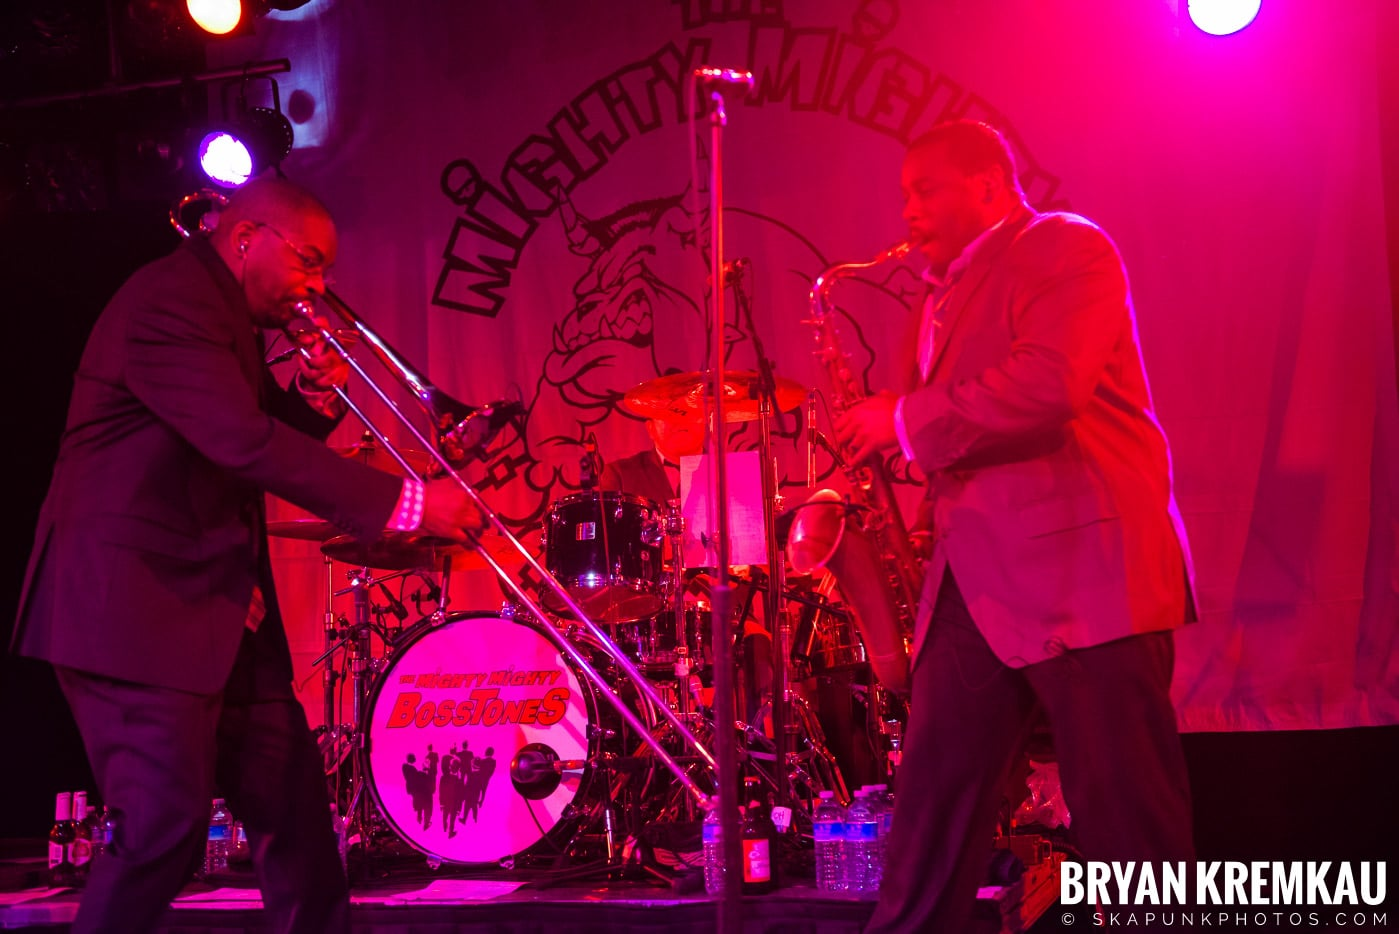 Mighty Mighty Bosstones @ Starland Ballroom, Sayreville, NJ - 7.29.17 (25)